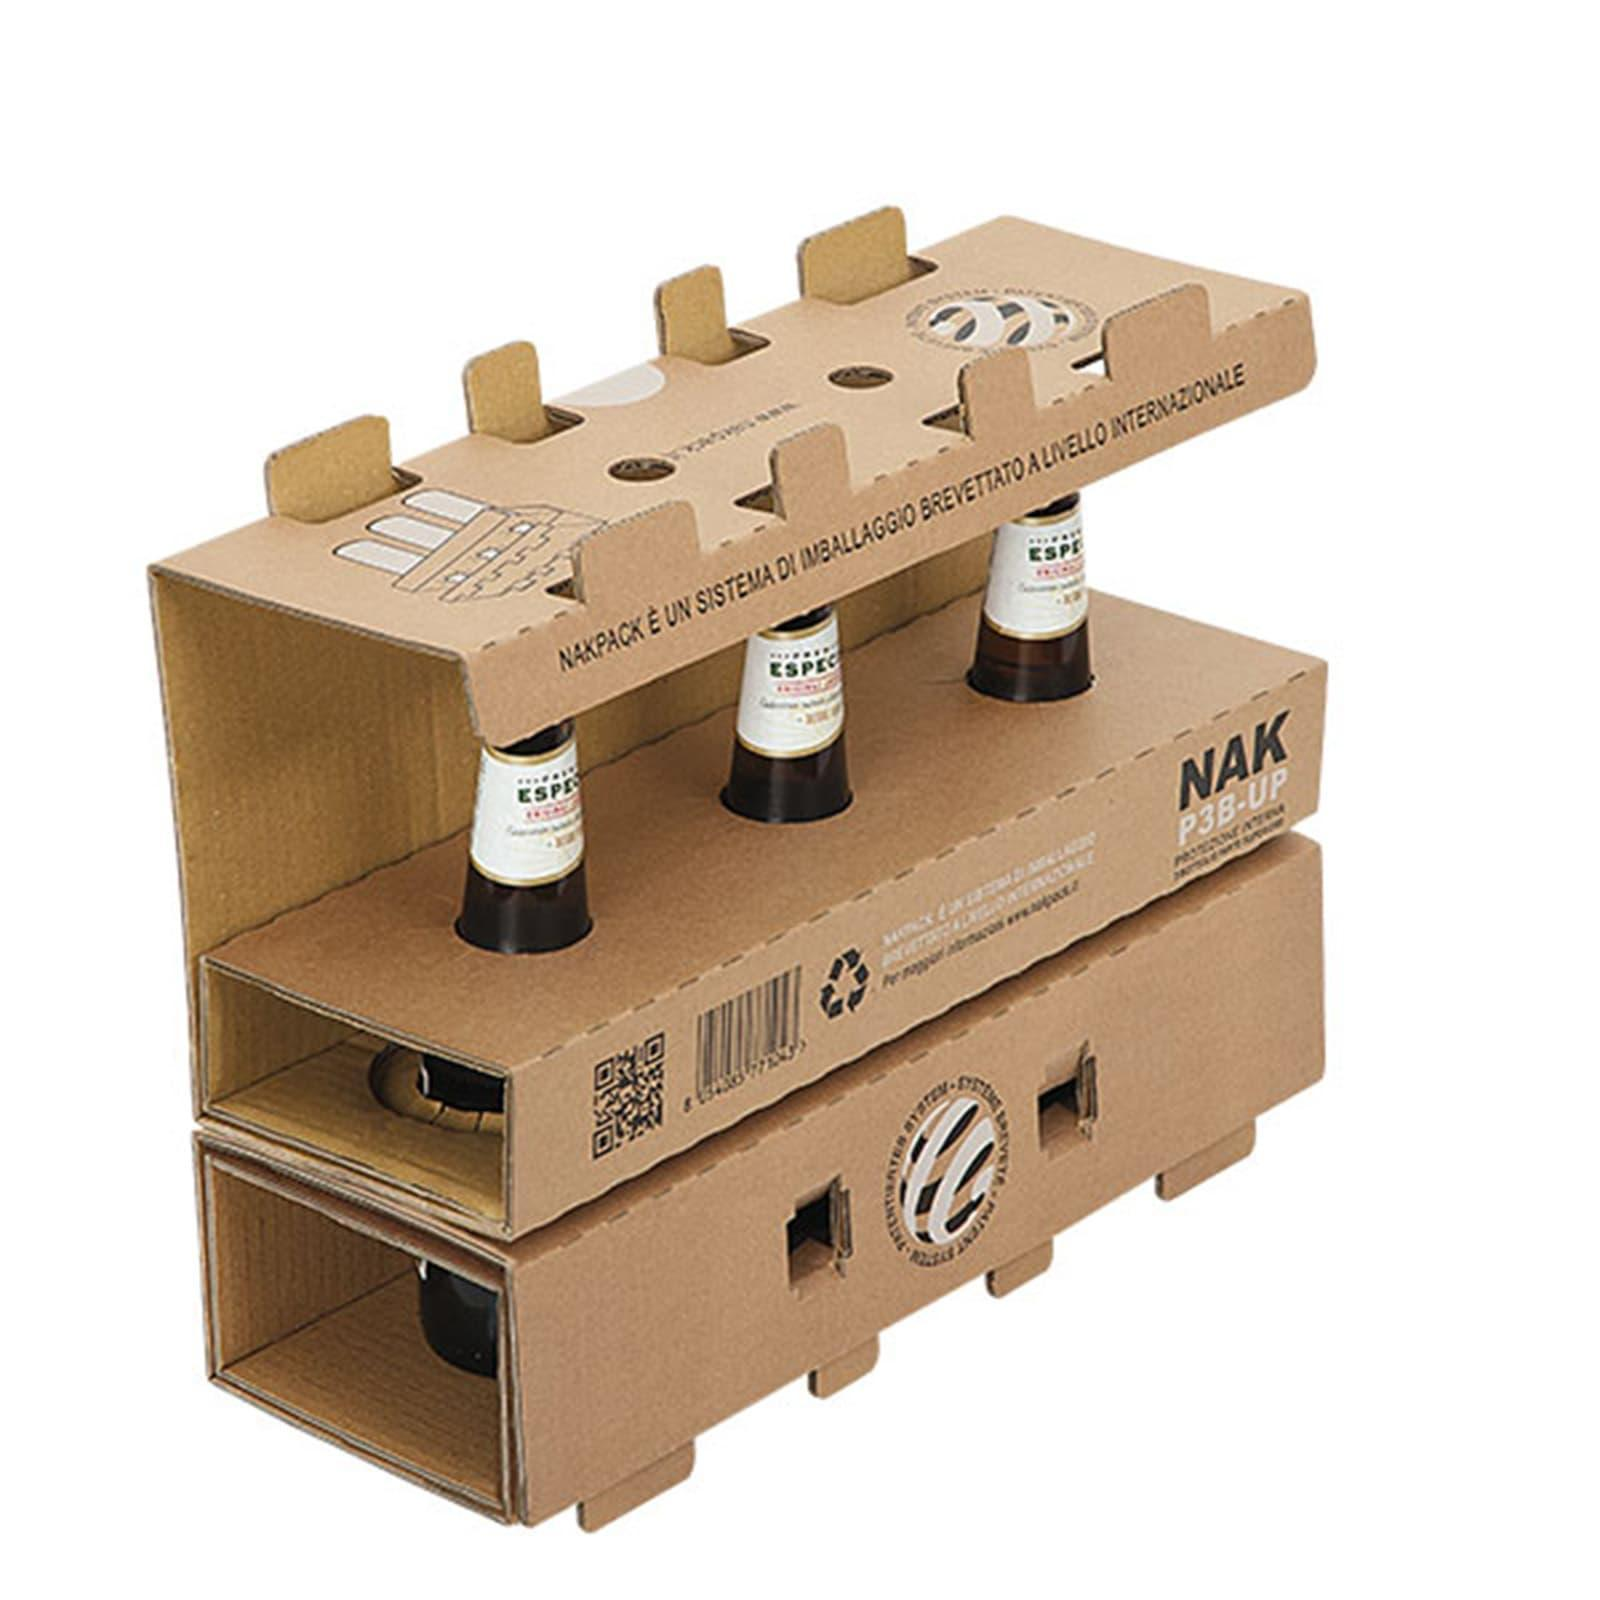 Картонная защитная упаковка для доставки пива от NIKPACK